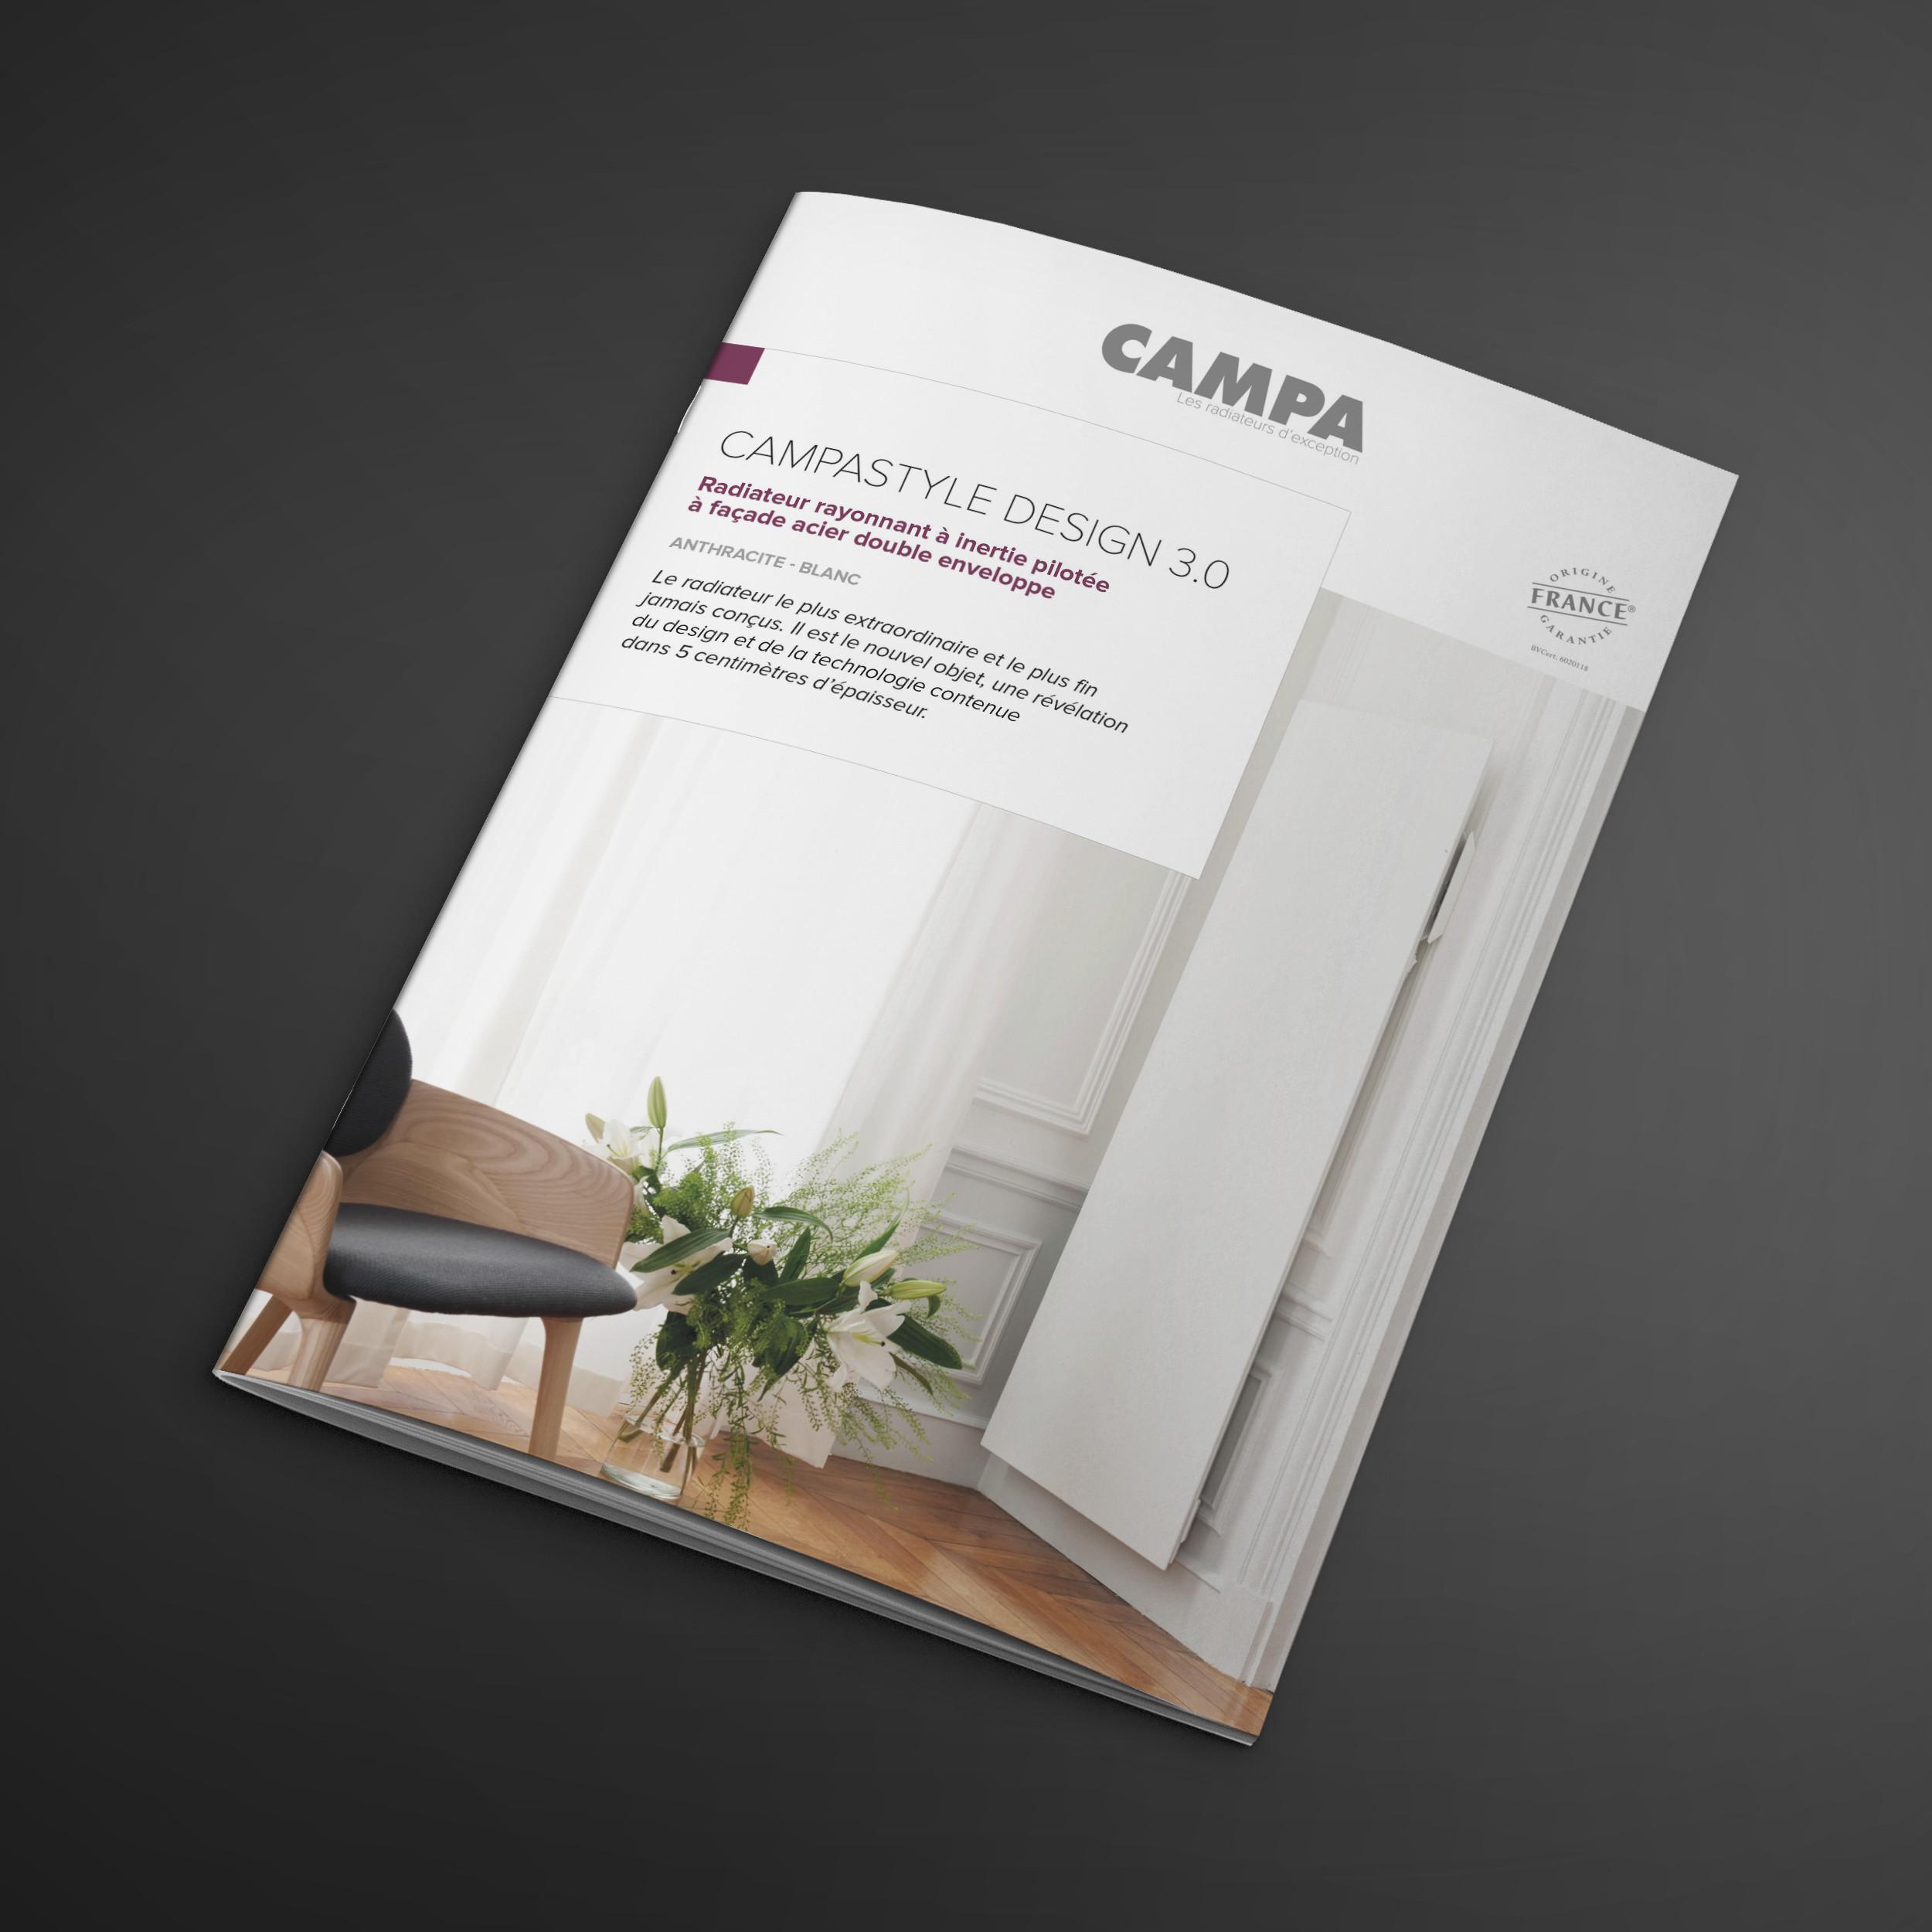 CAMPASTYLE DESIGN 3.0